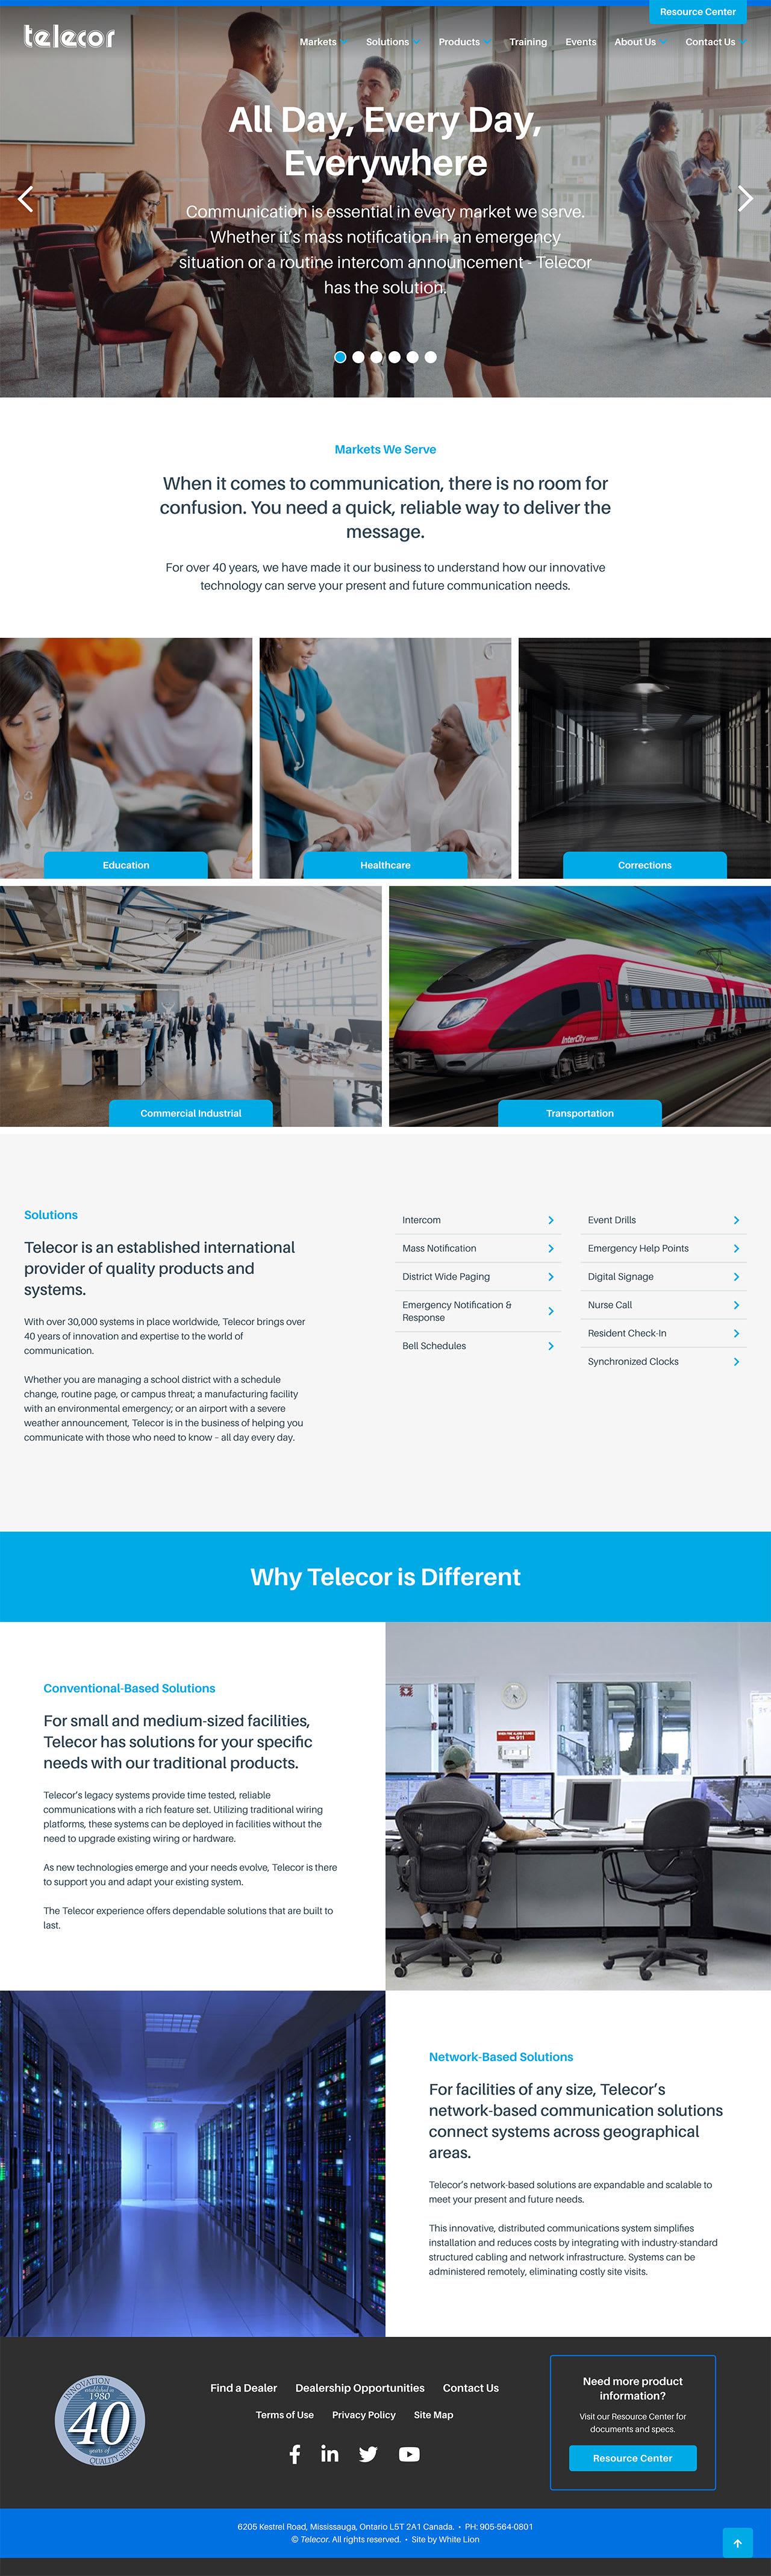 telecor-homepage.jpg